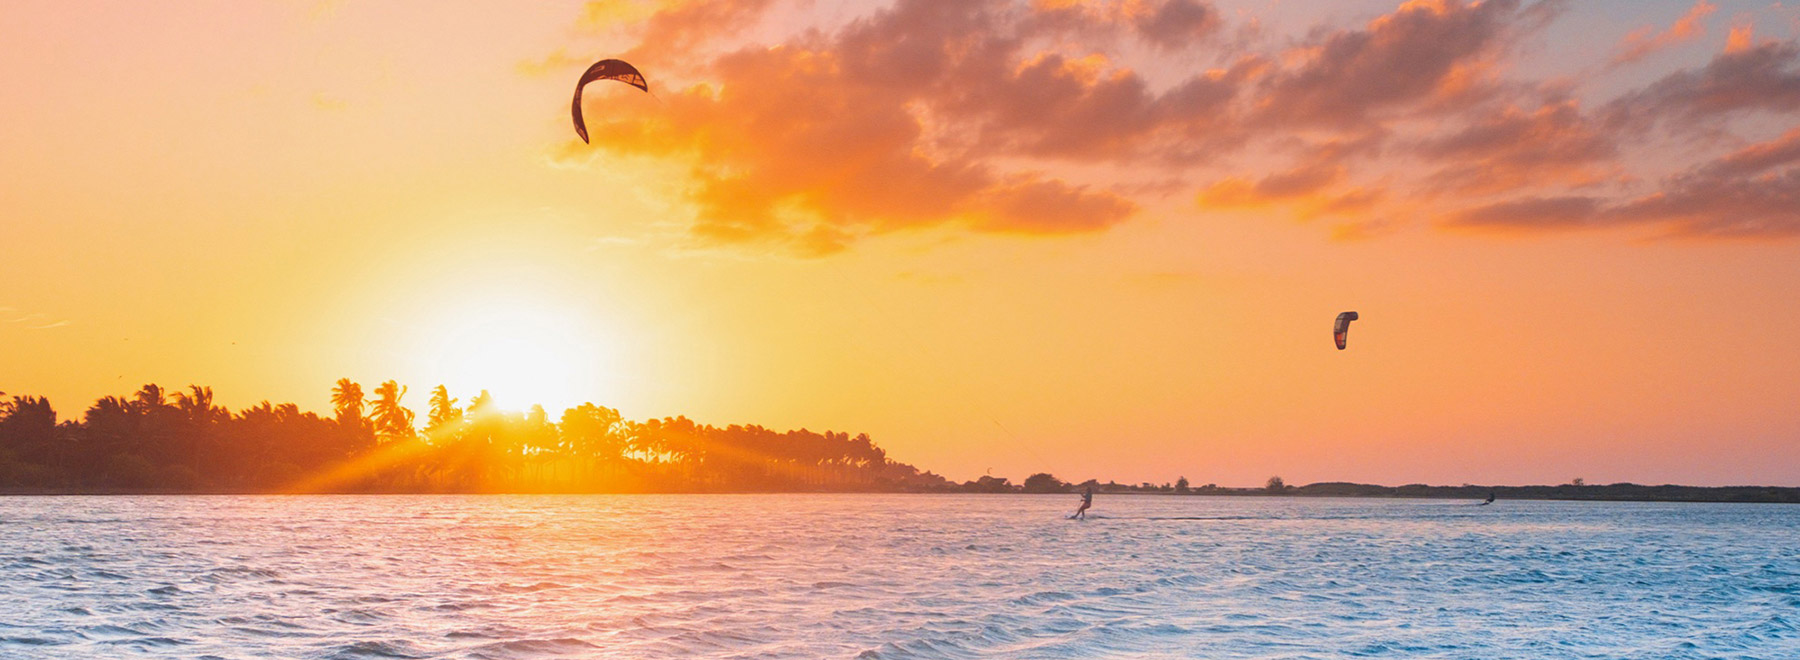 Kitereisen, SriLanka